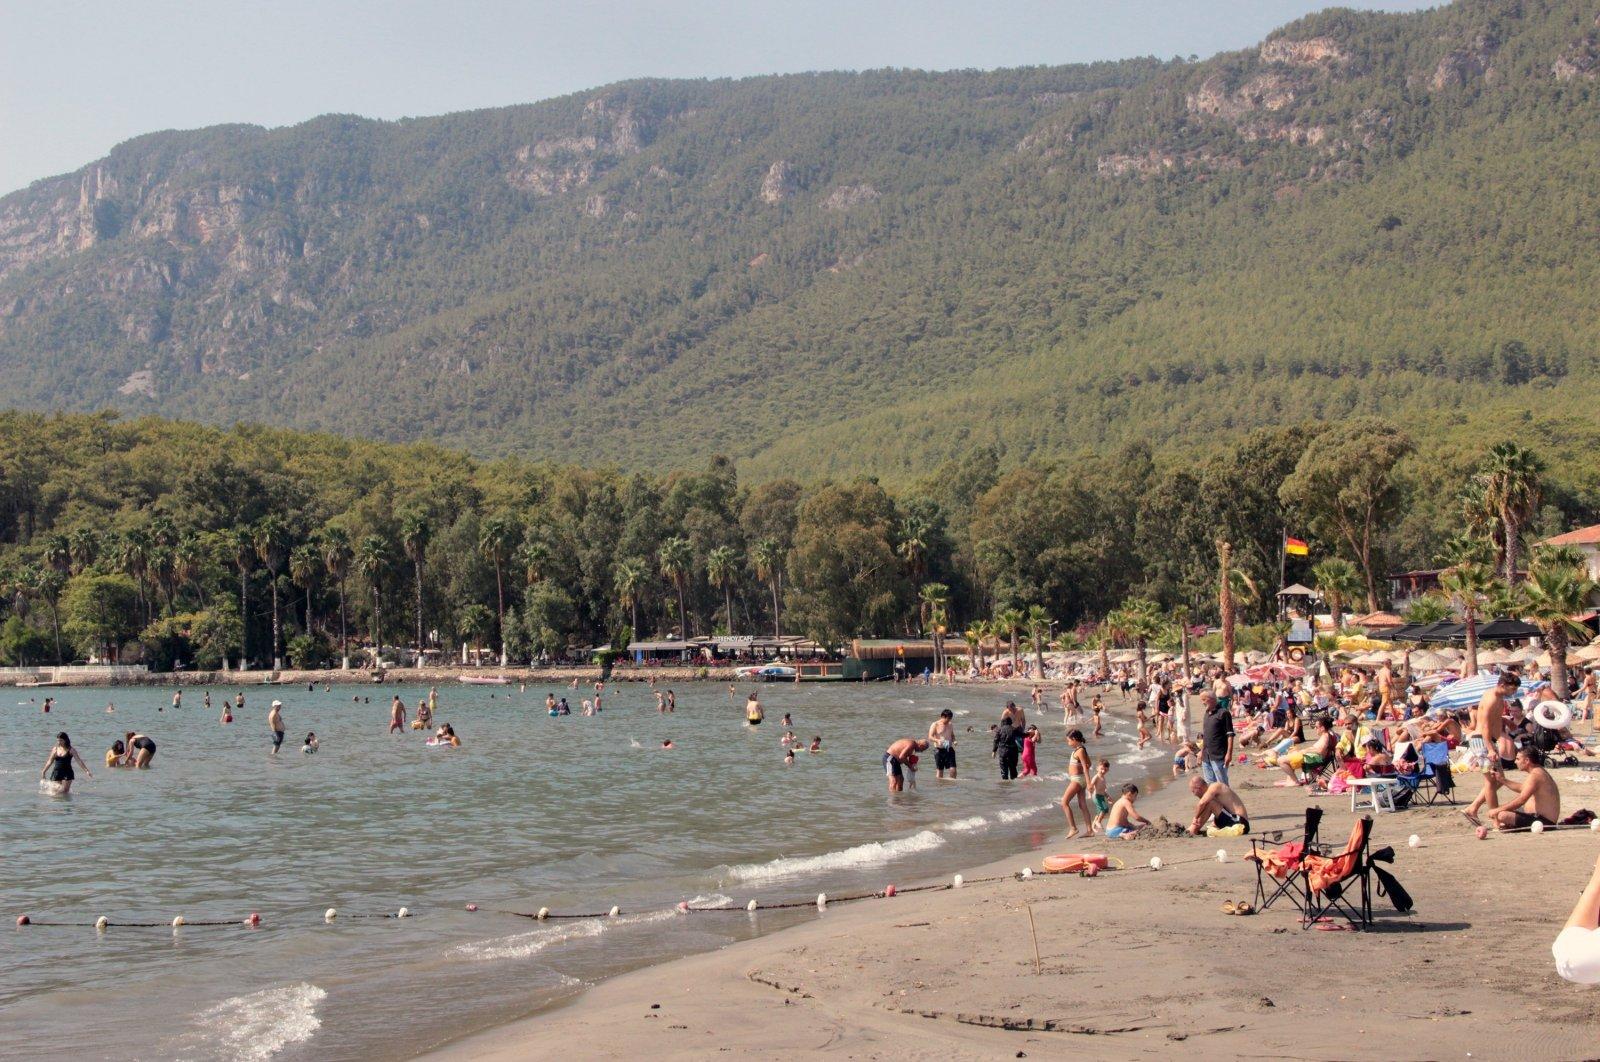 View of people on a beach in Muğla, southwestern Turkey, Sept. 19, 2021. (İHA PHOTO)